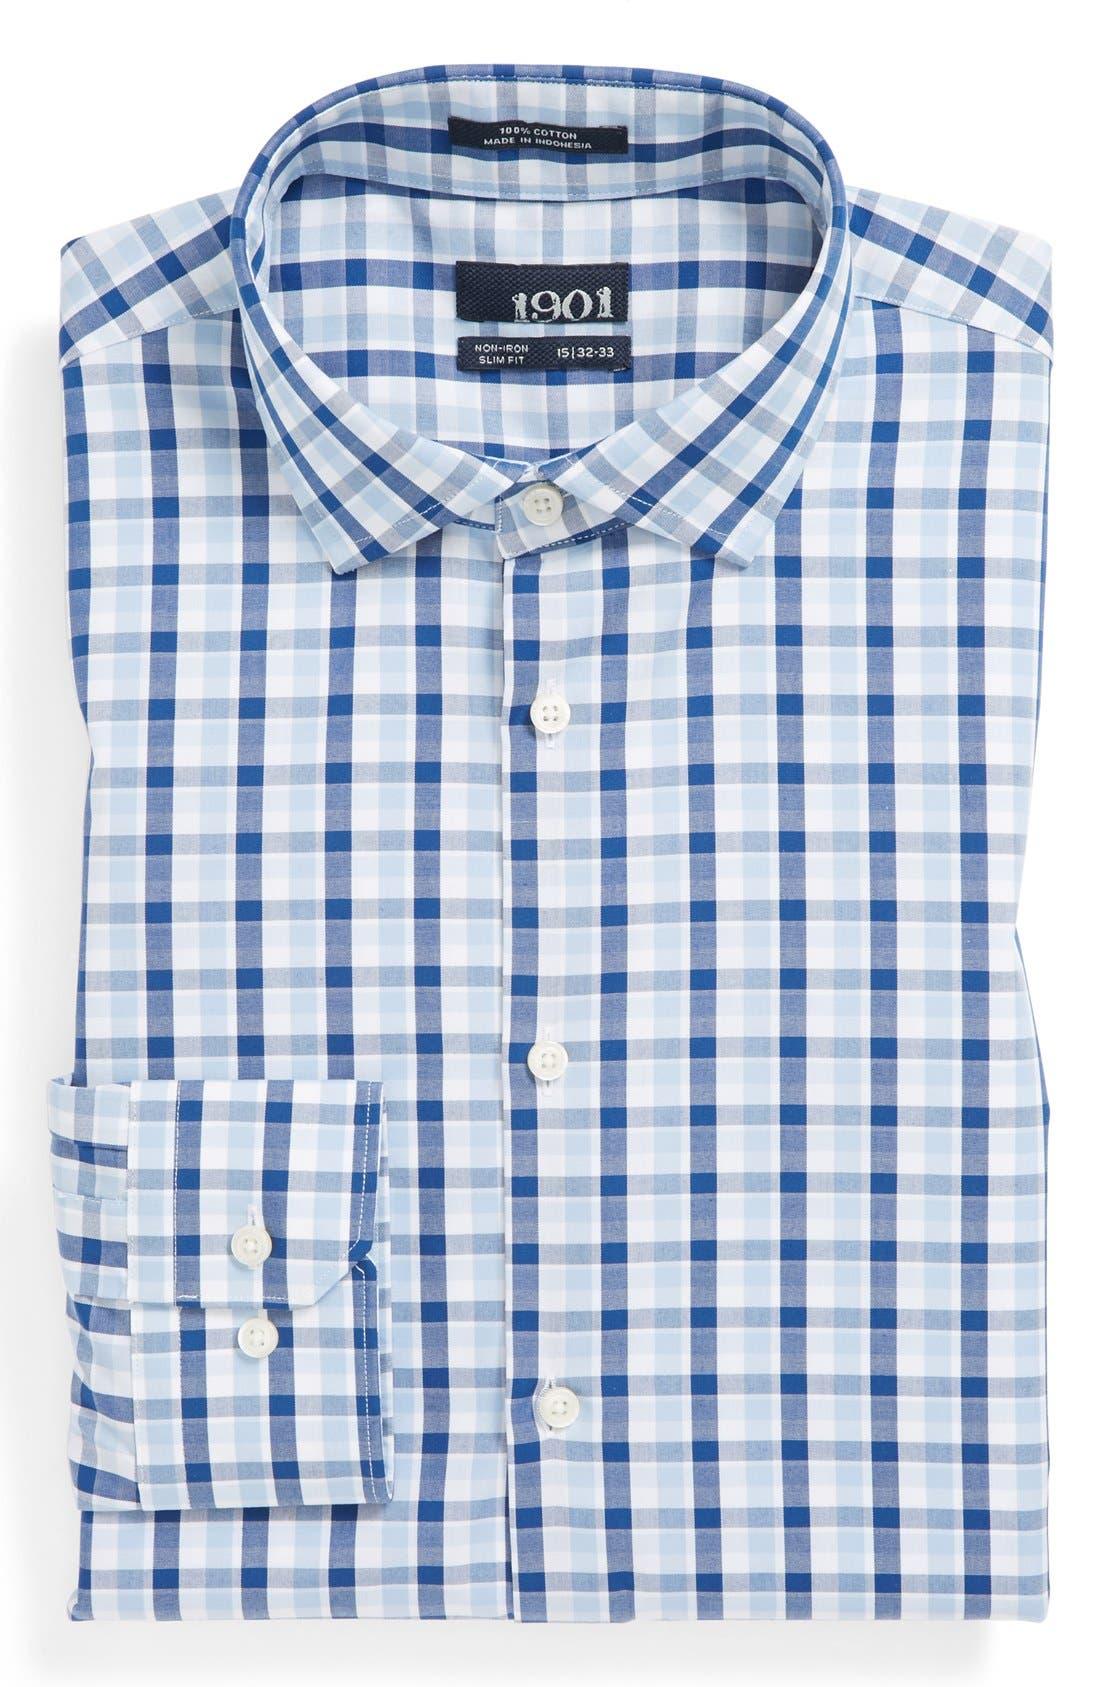 Alternate Image 1 Selected - 1901 Slim Fit Non-Iron Check Dress Shirt